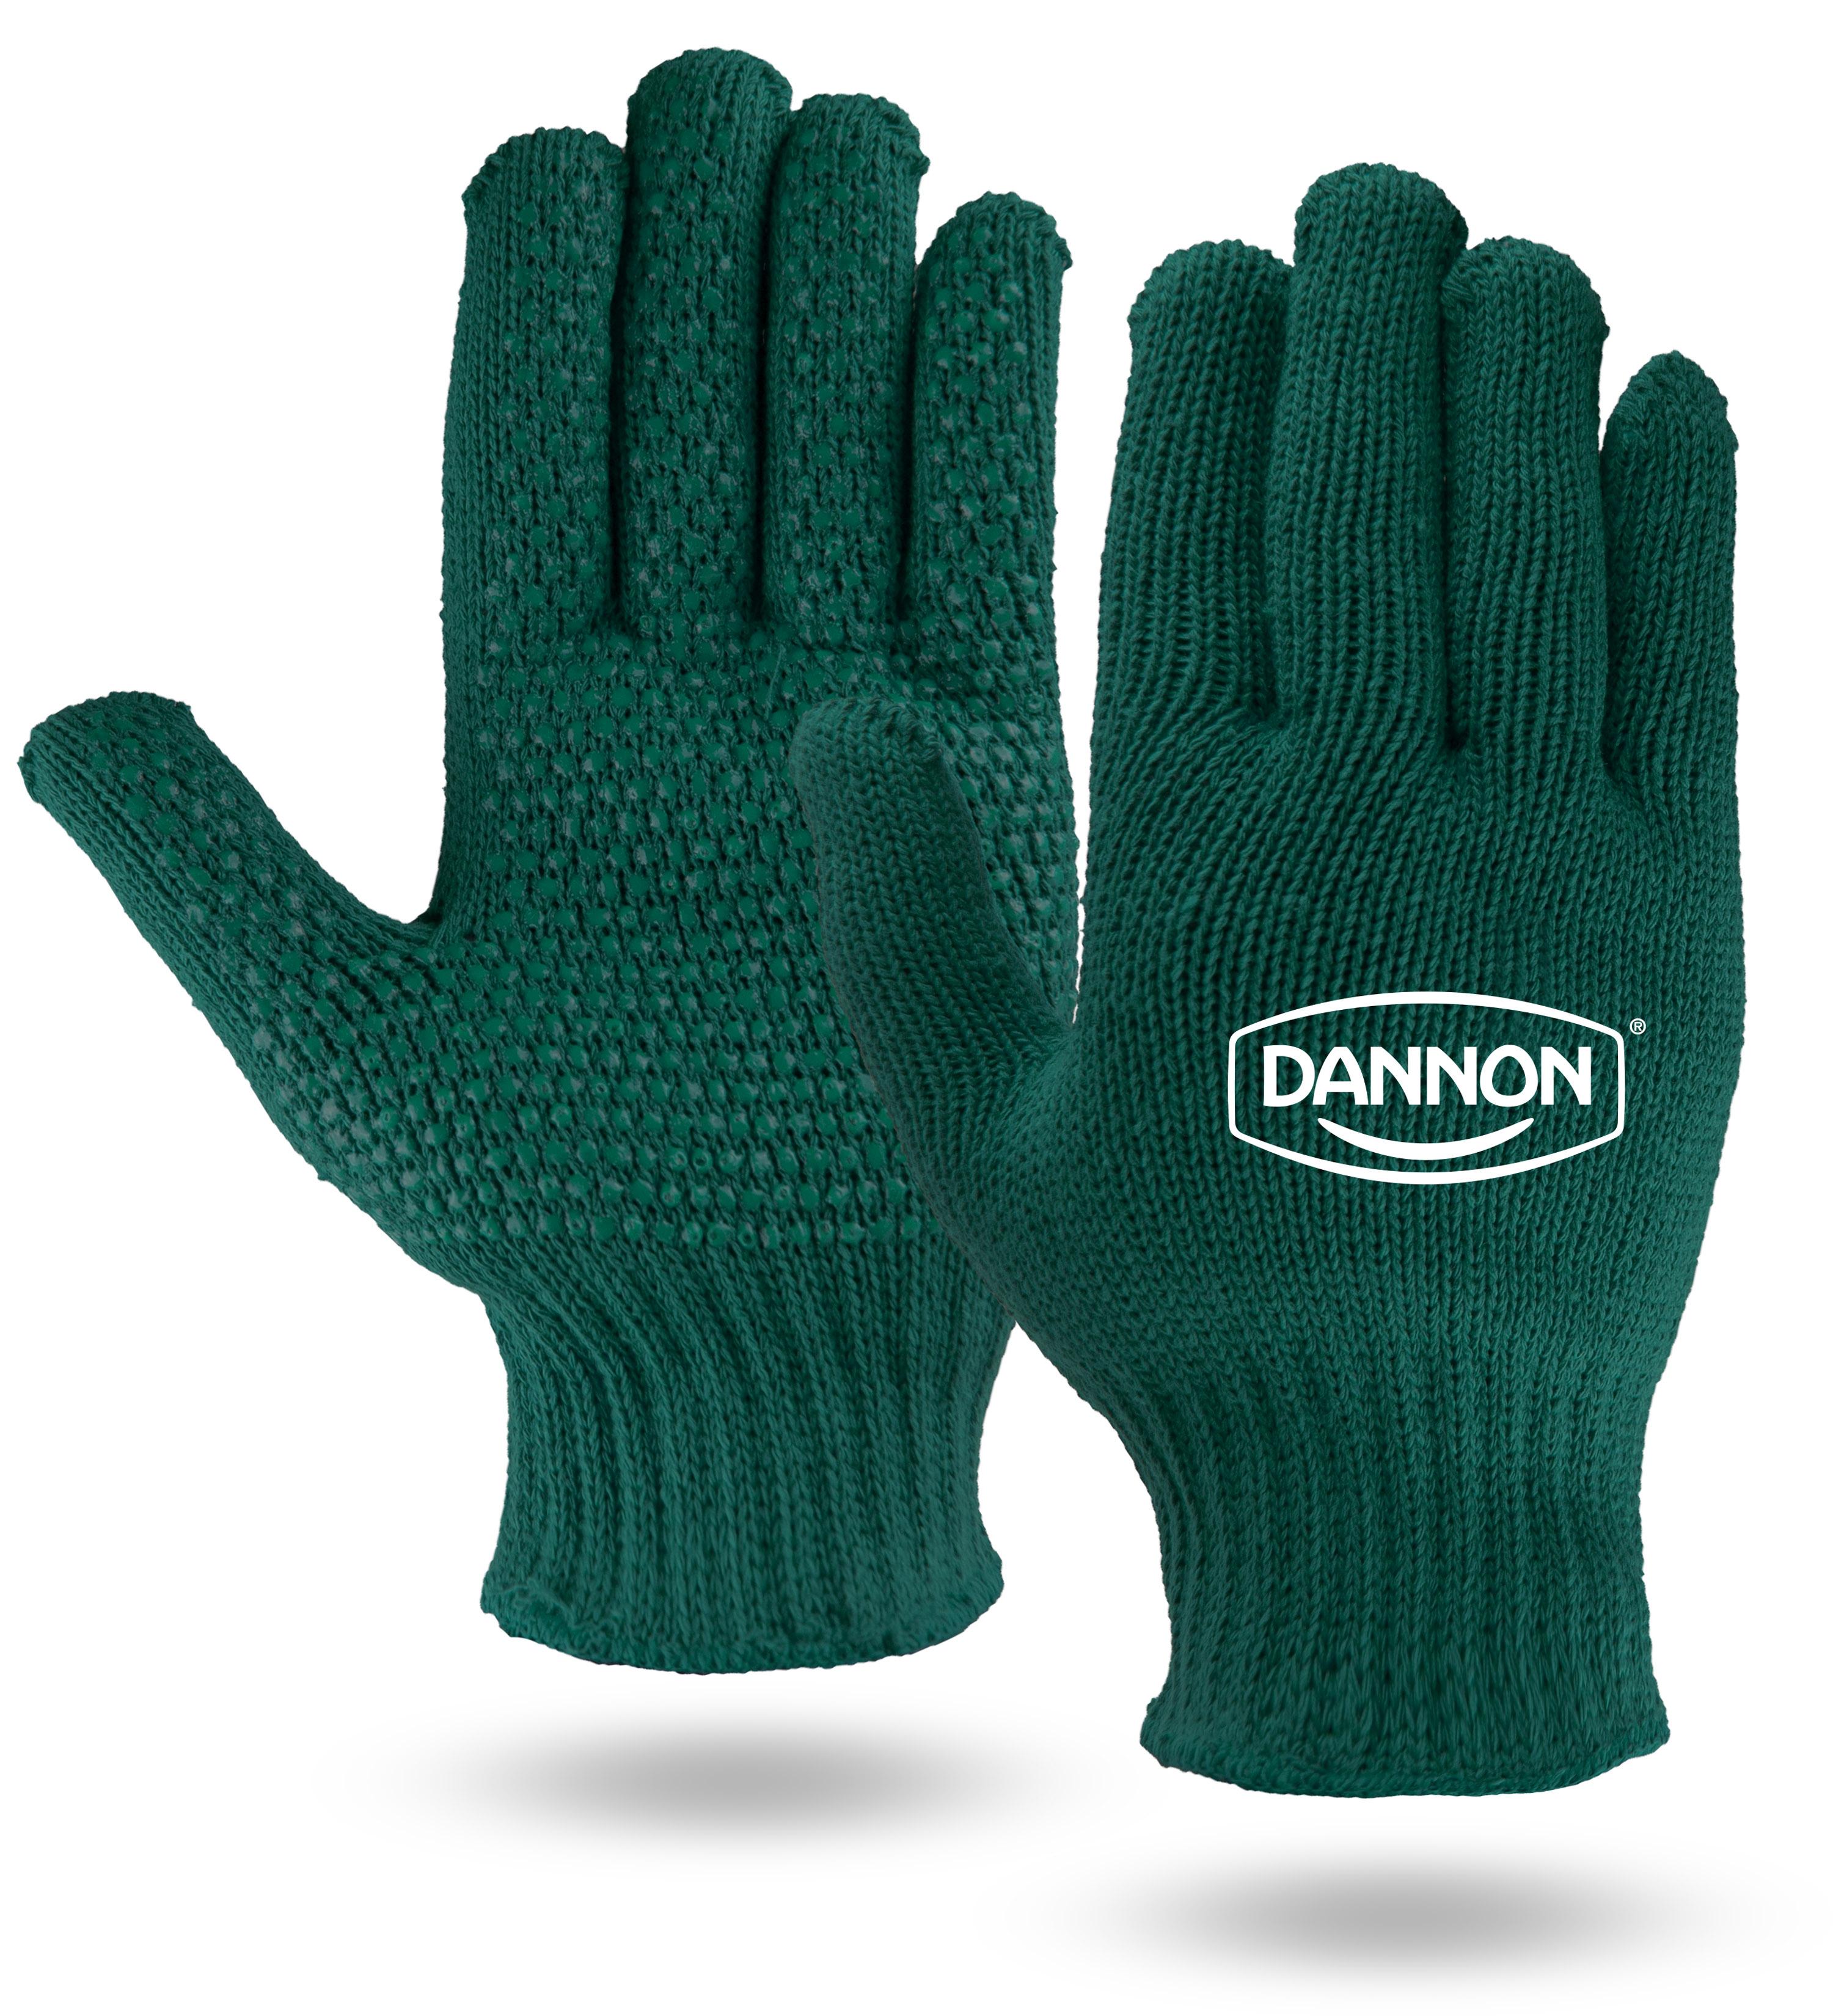 Green Knit Freezer Gloves